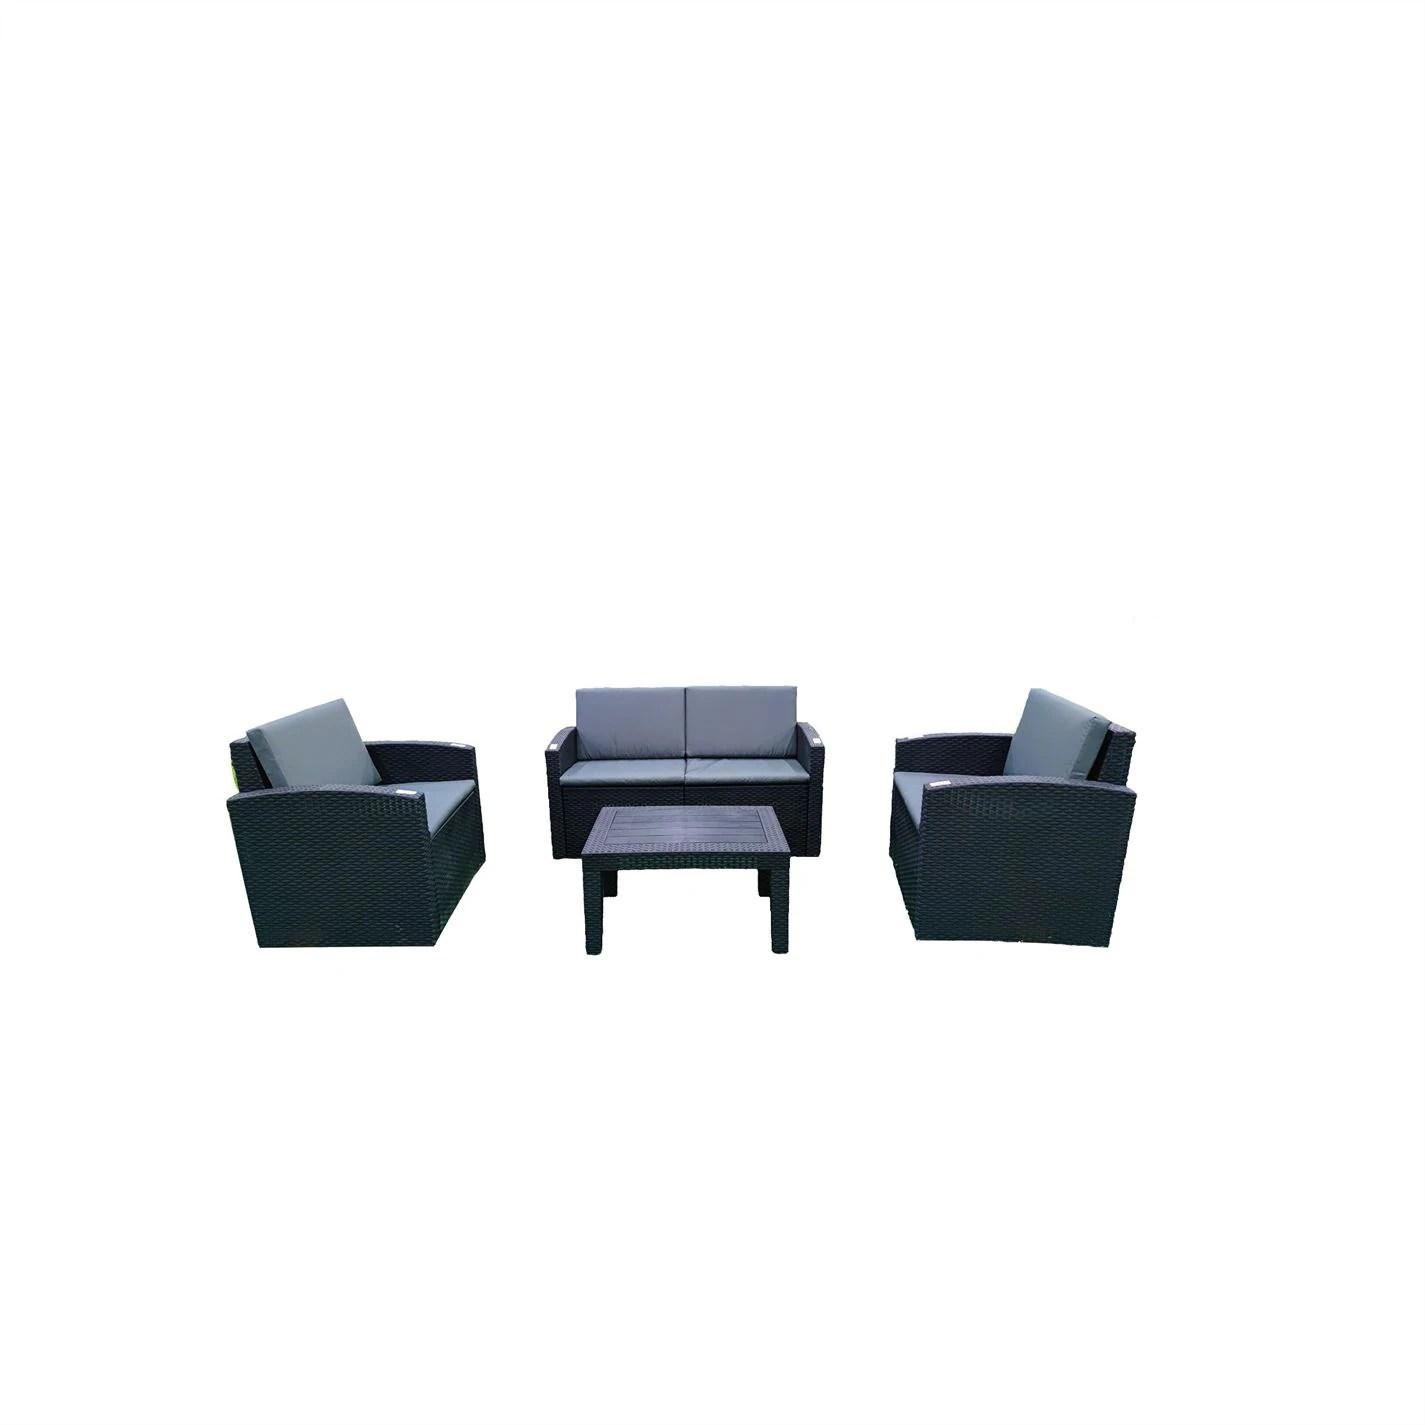 culcita home 4 piece lounge garden patio furniture set